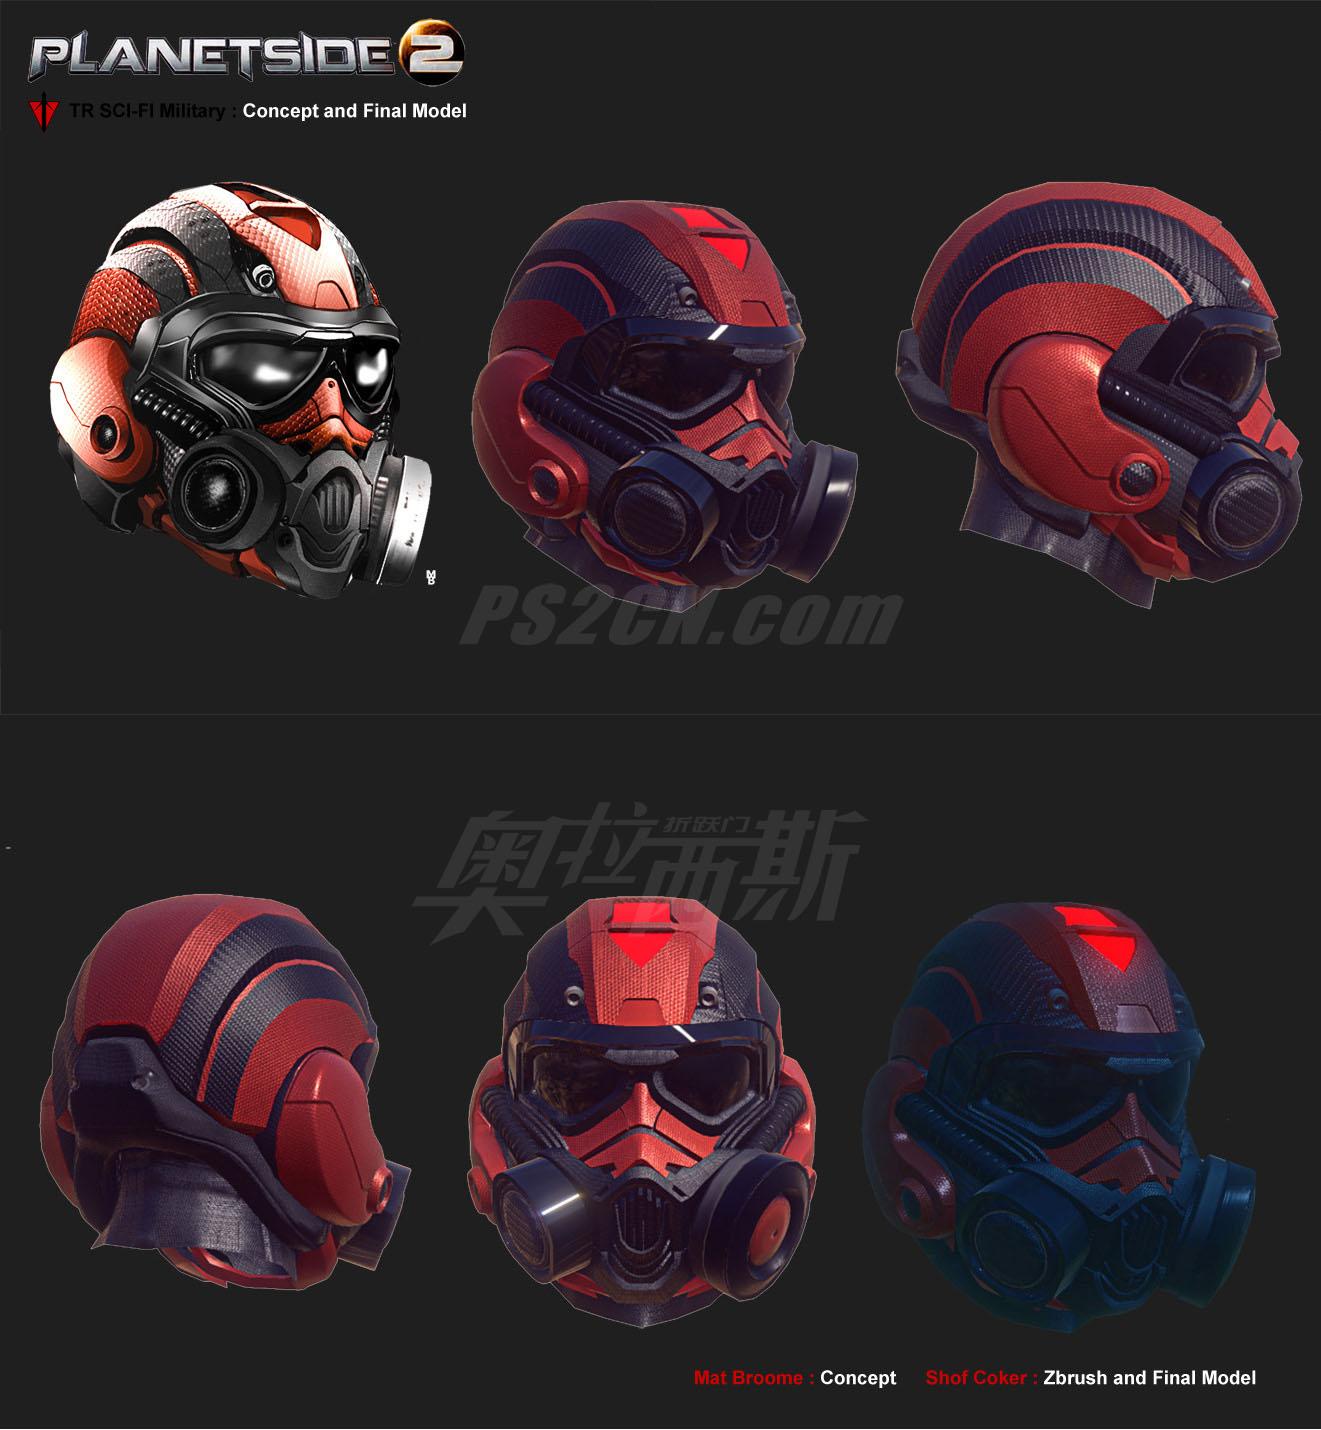 tr科幻风头盔.jpg